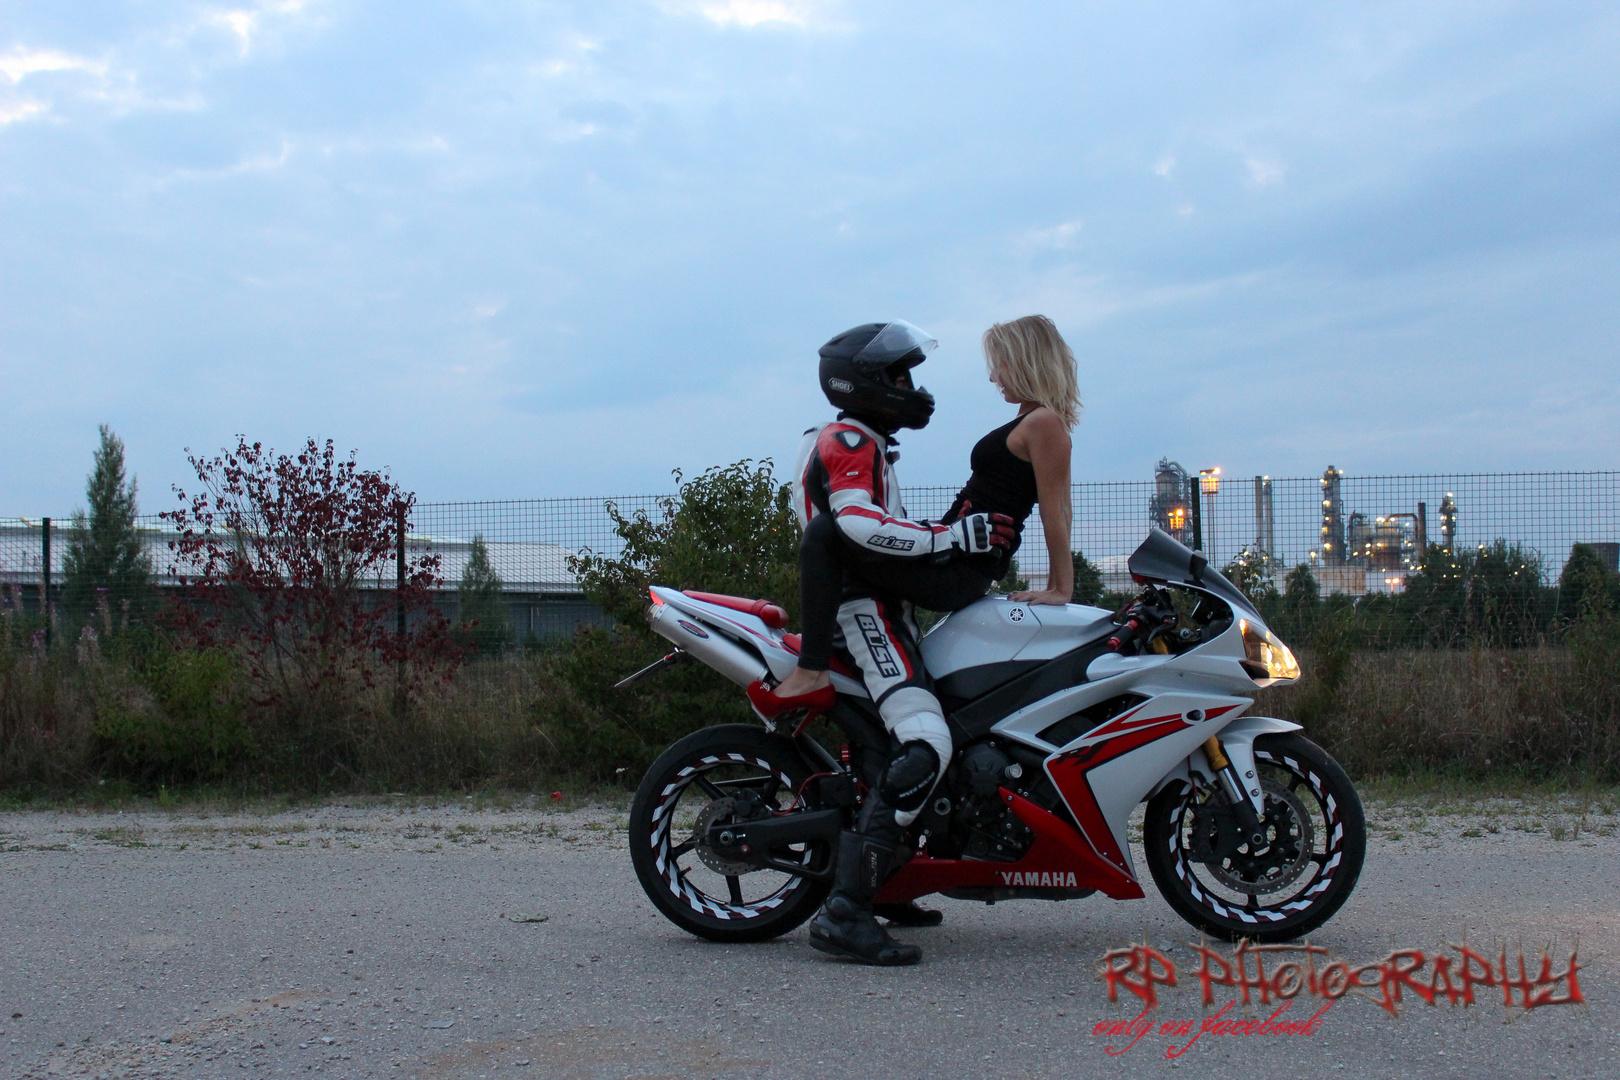 Motorradshooting 28.08.2013